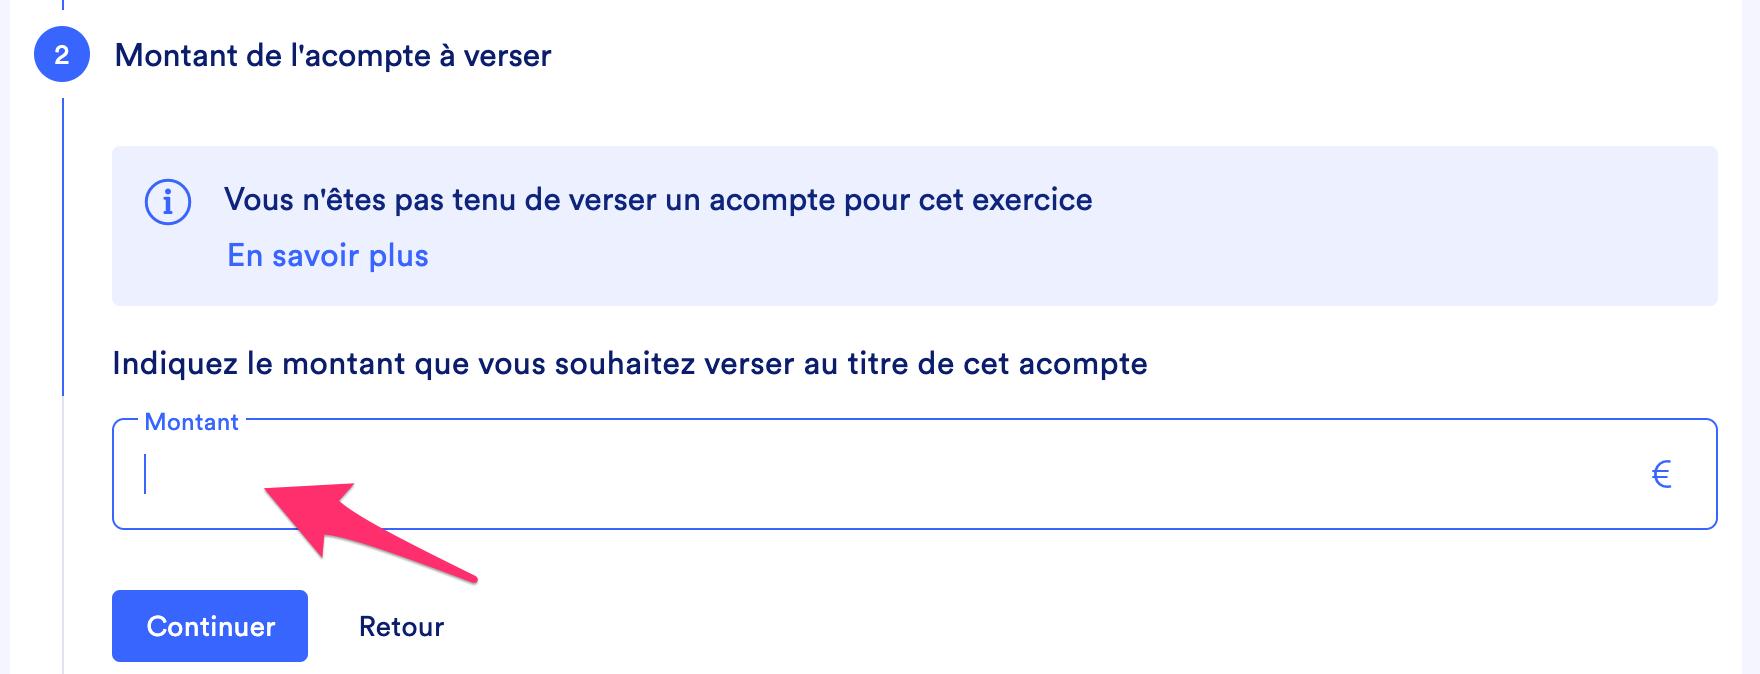 Indy_régime_simplifié_TVA2